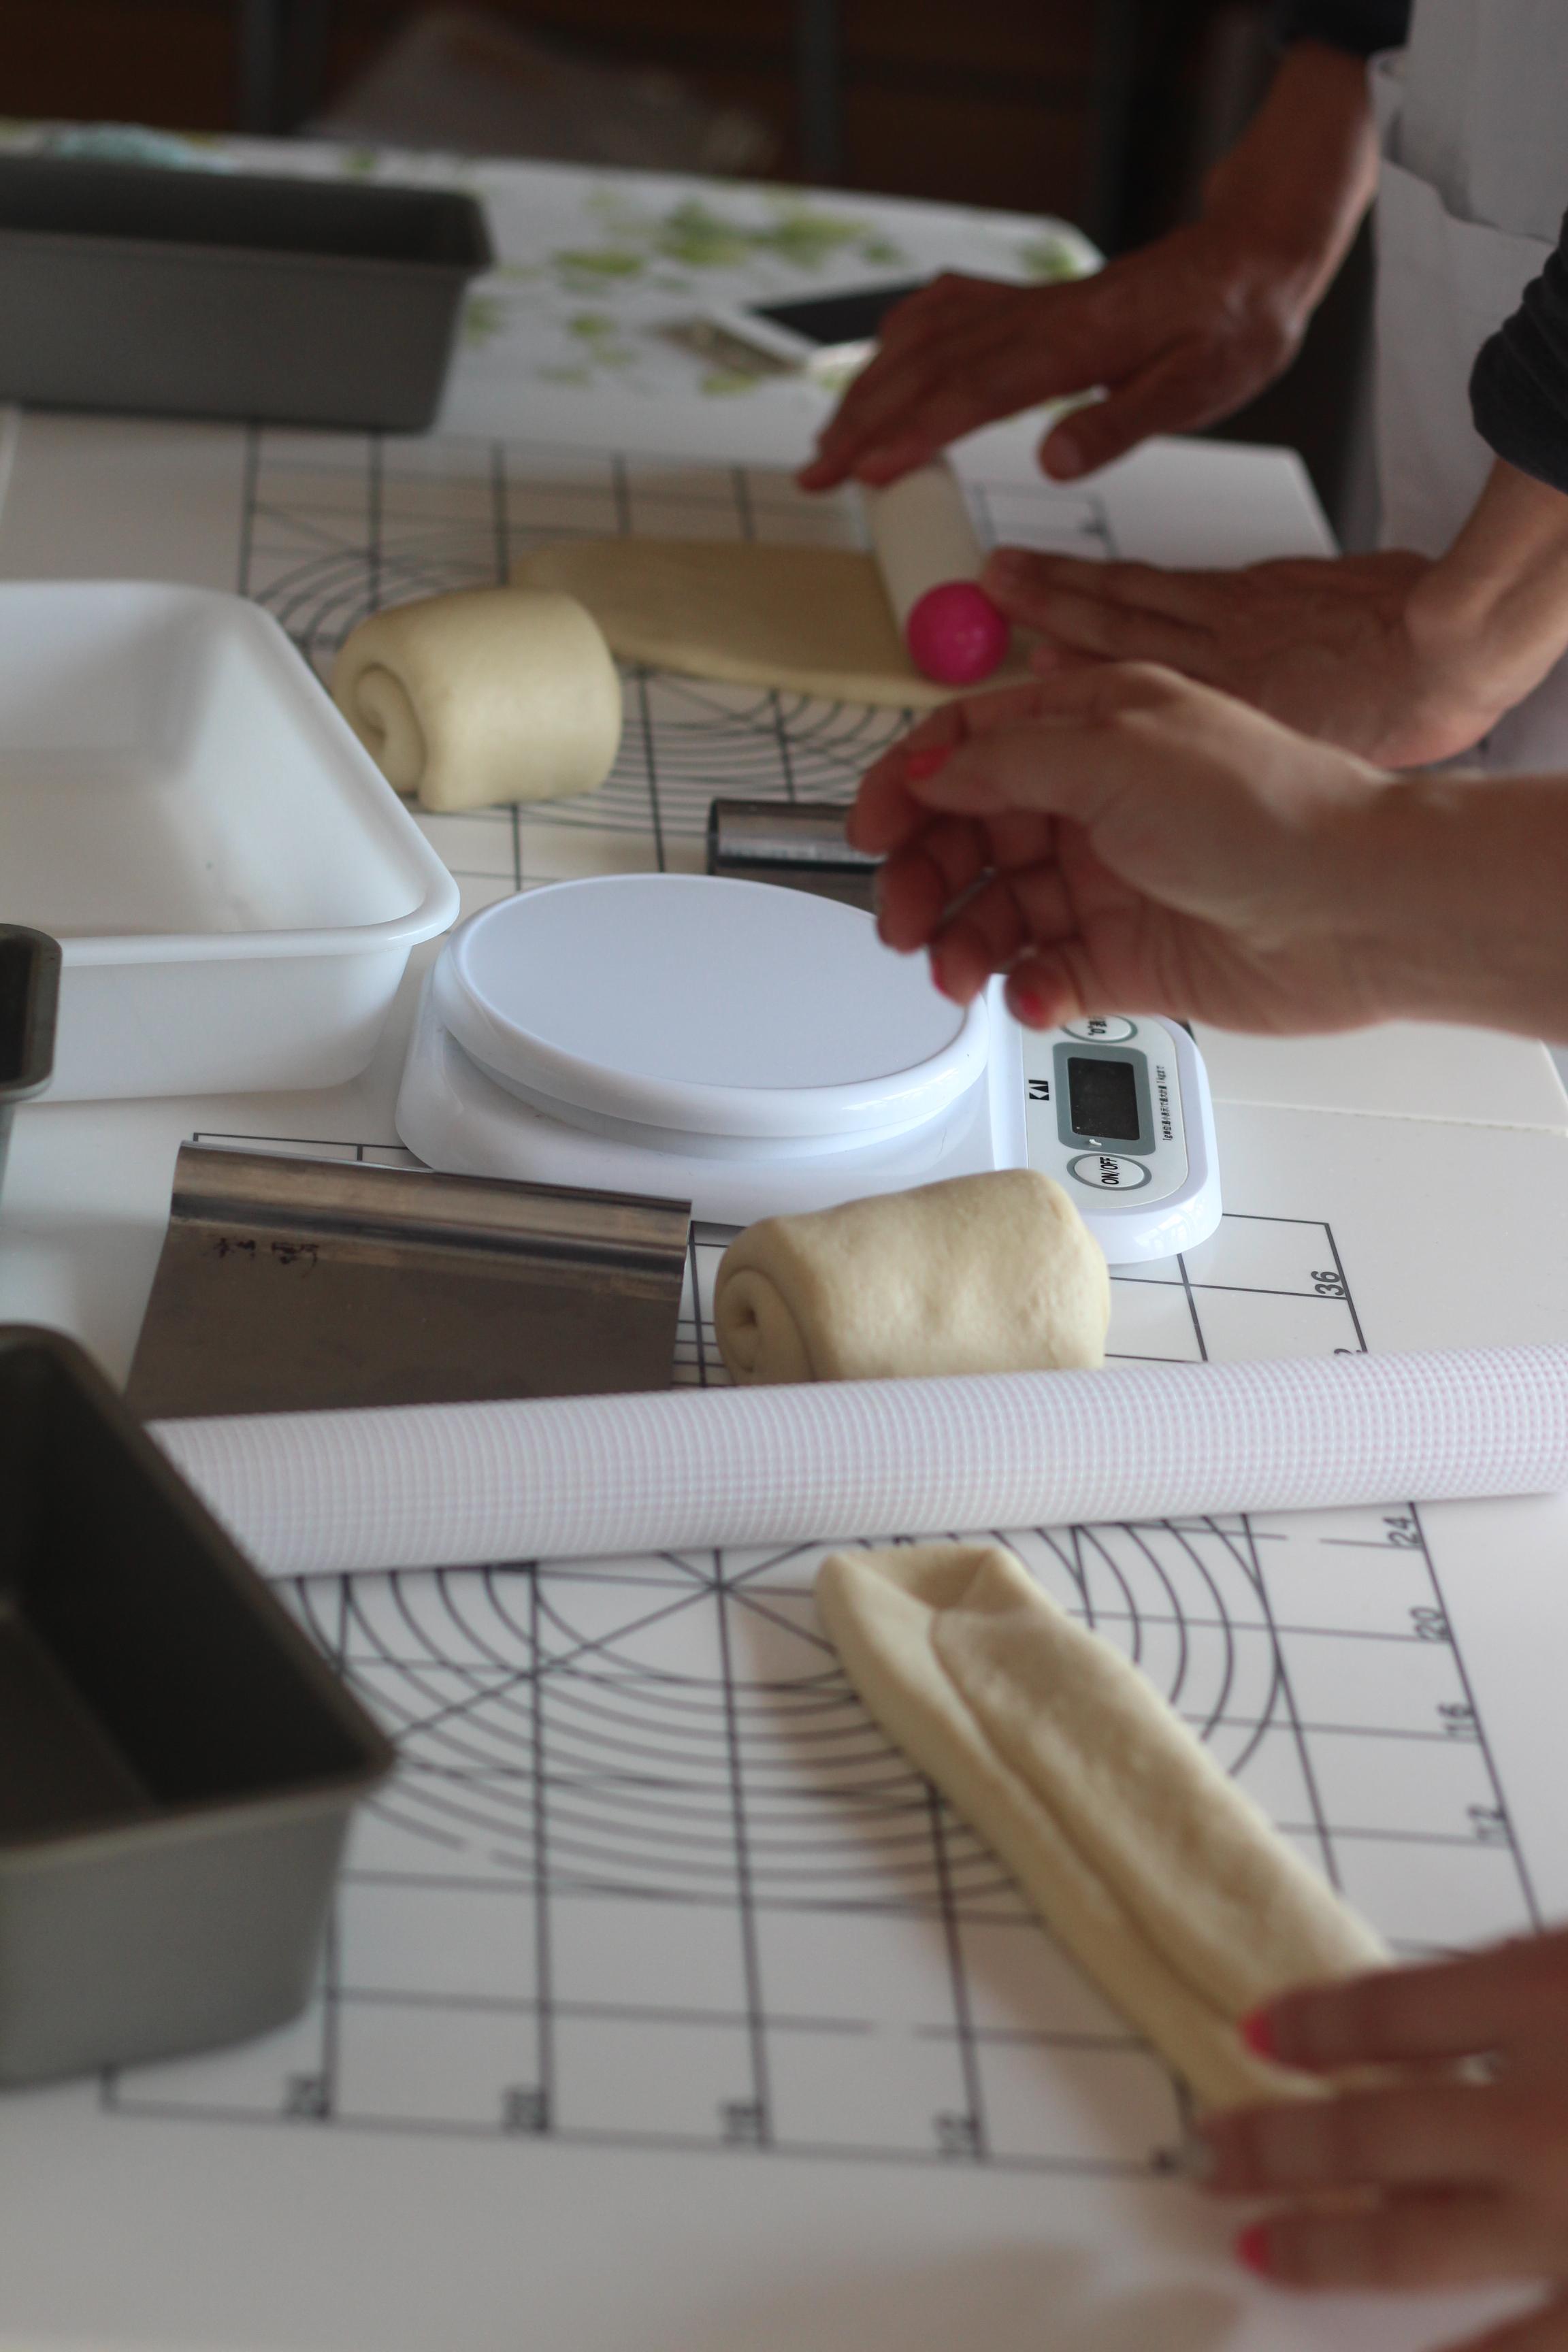 a-ta-sante糖質制限パン料理教室、阿倍野区西田辺。京都江部粉糖質制限パンベーシックコース最終回、山食&ごまパン。